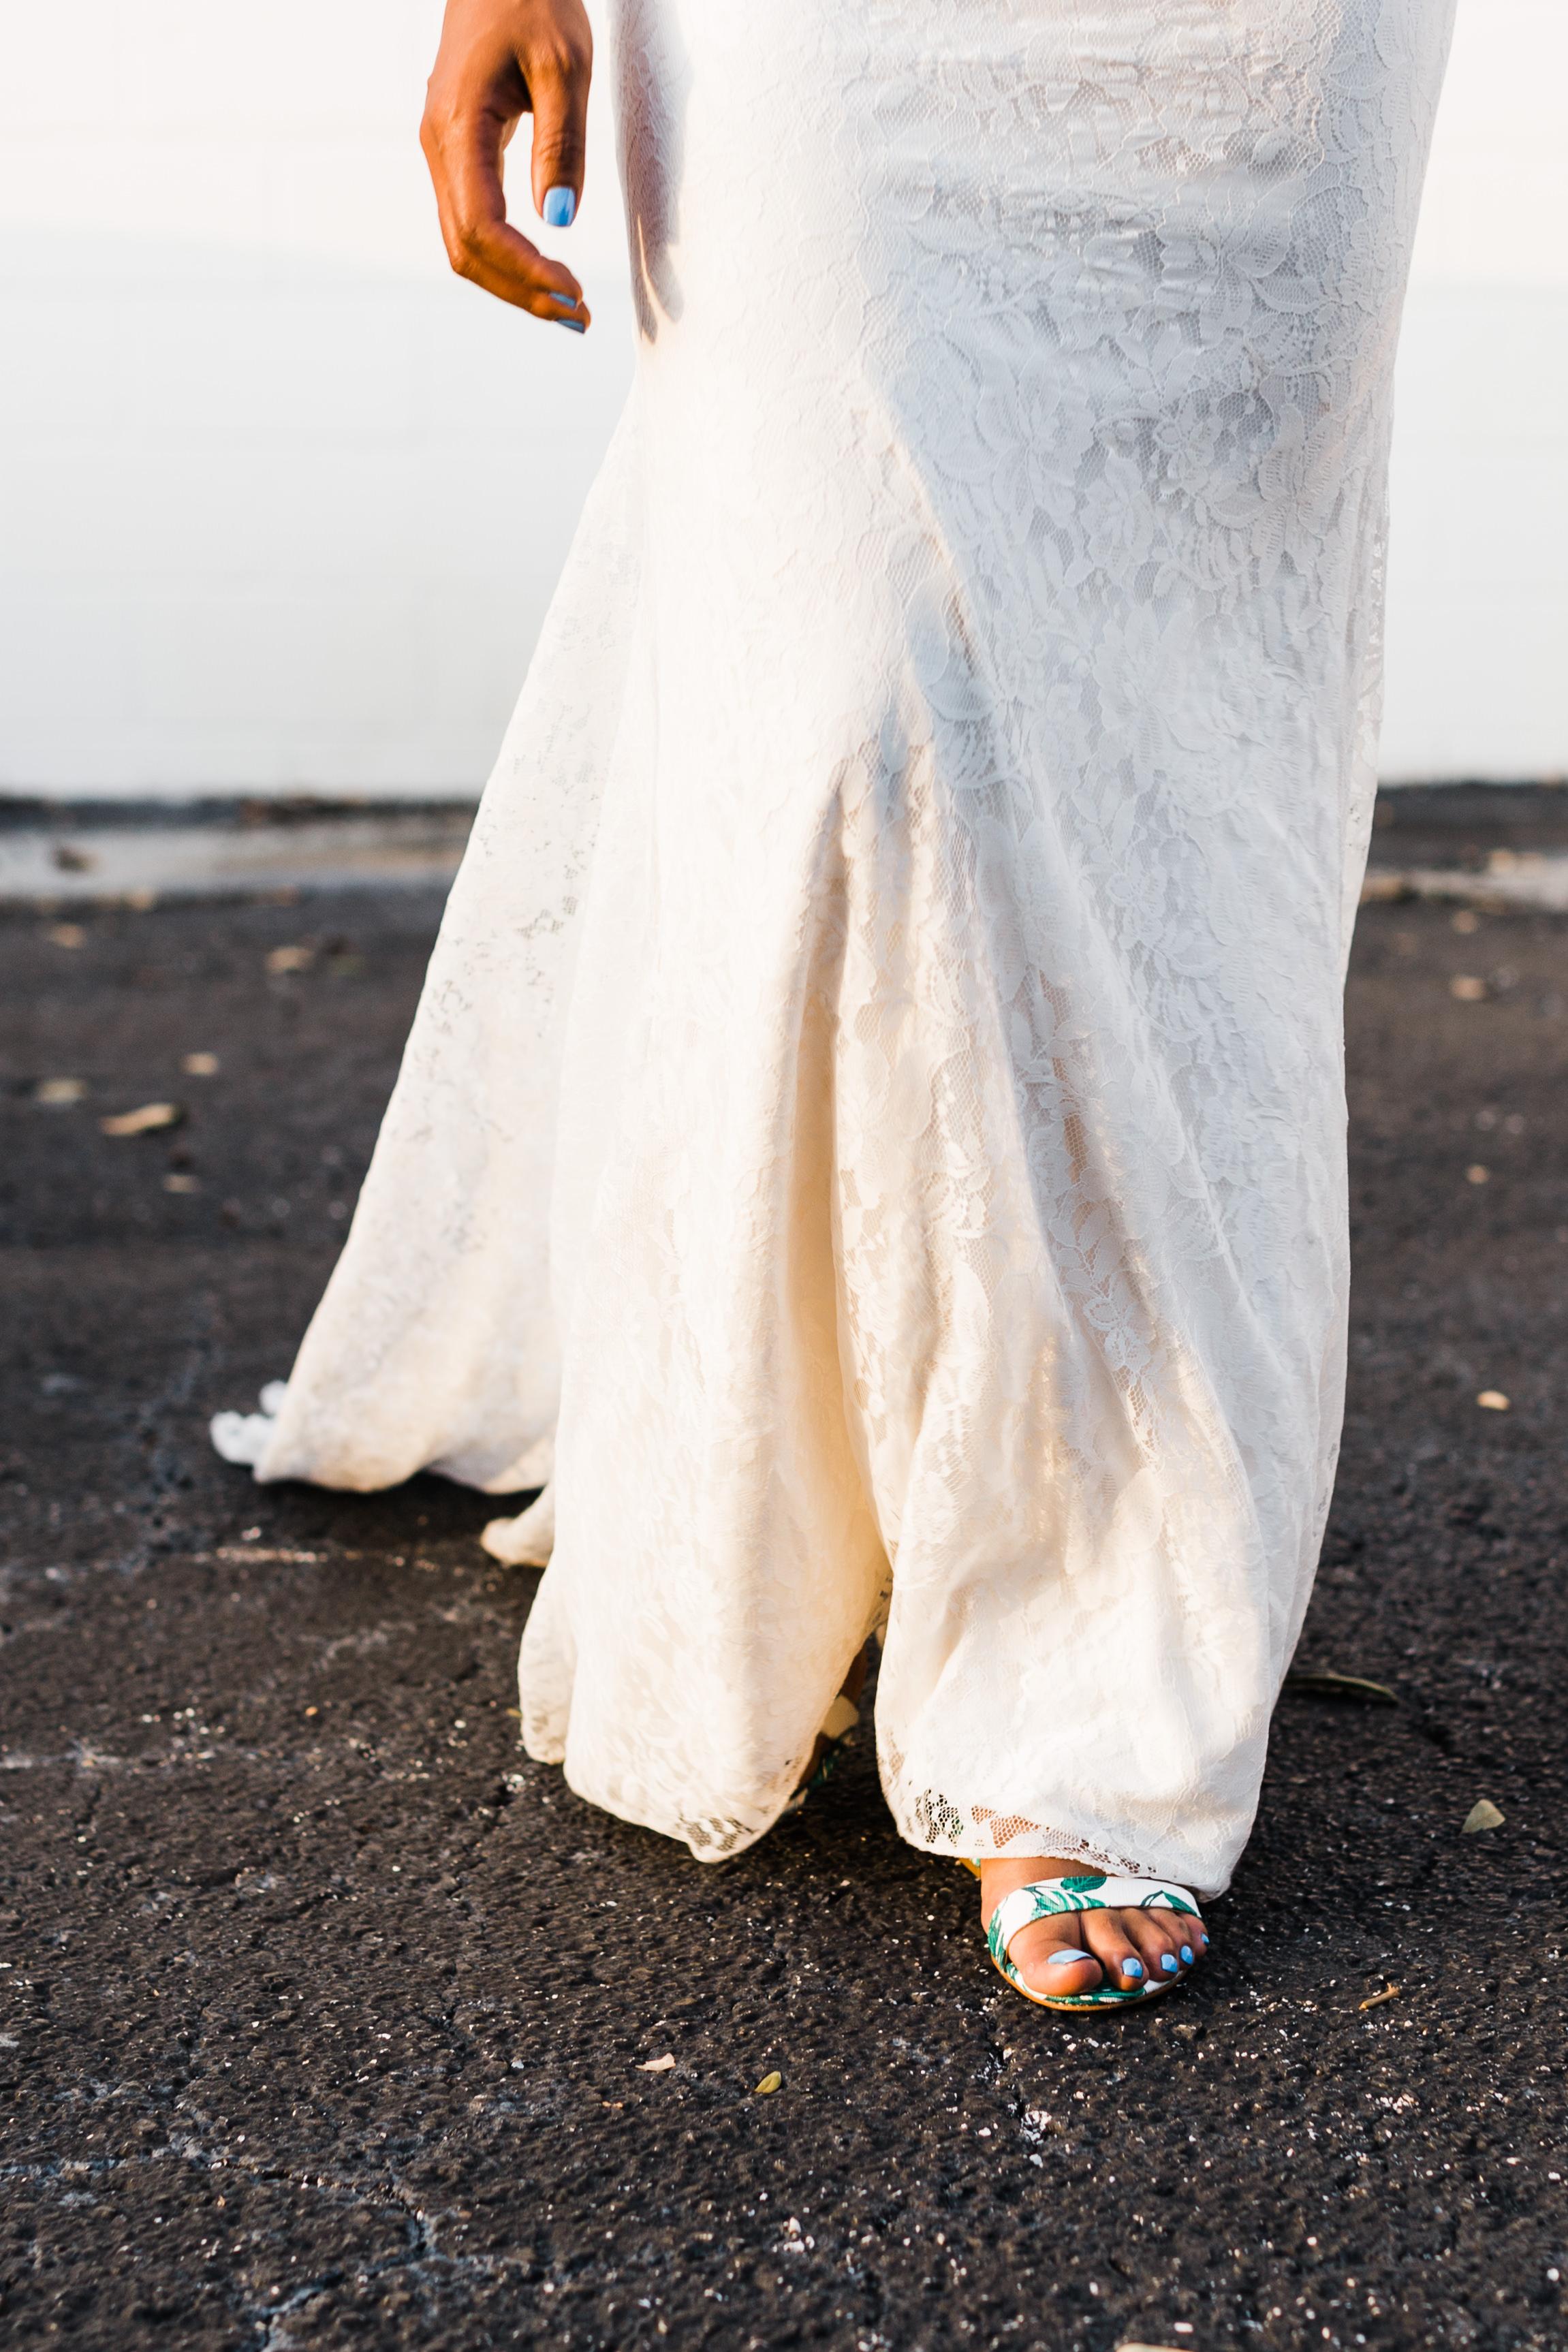 2017.09.16 Ashley and Chuck O'Day Quantam Leap Winery Wedding (446 of 462).jpg